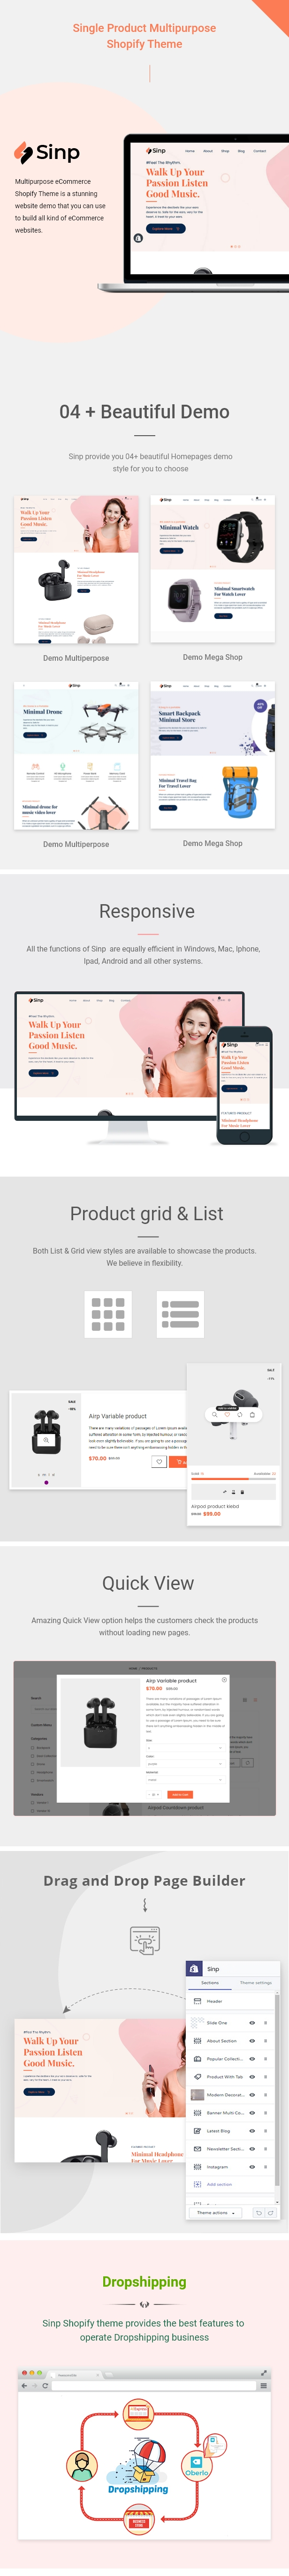 Sinp - Single Product Multipurpose Shopify Theme - 1